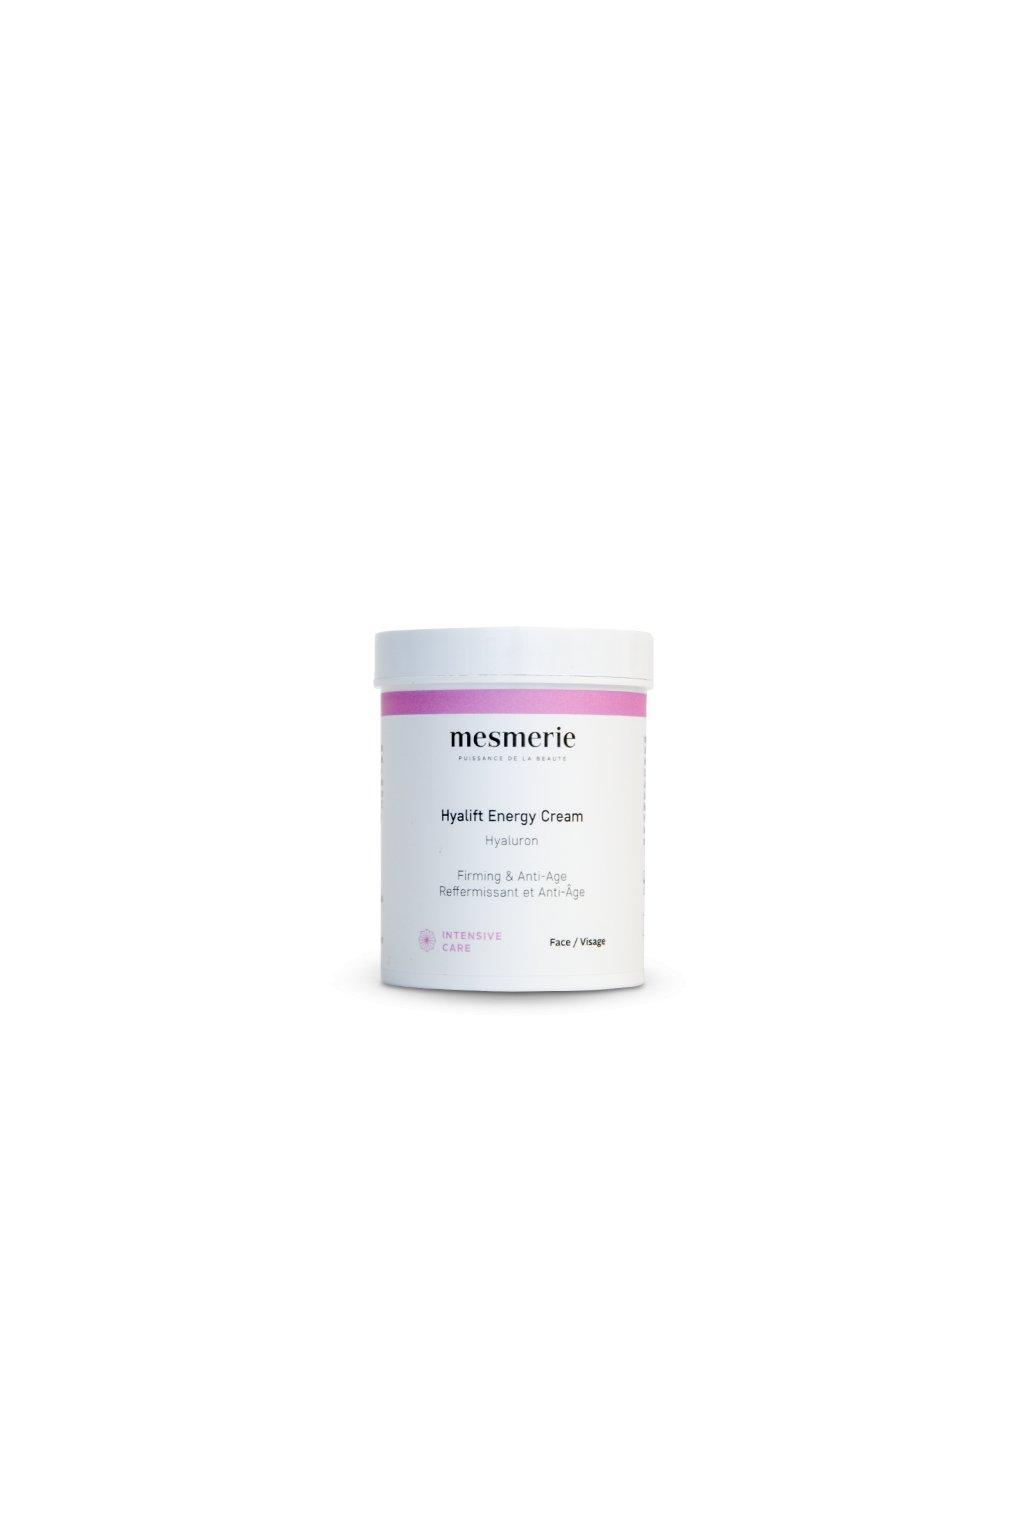 hyalift energy cream